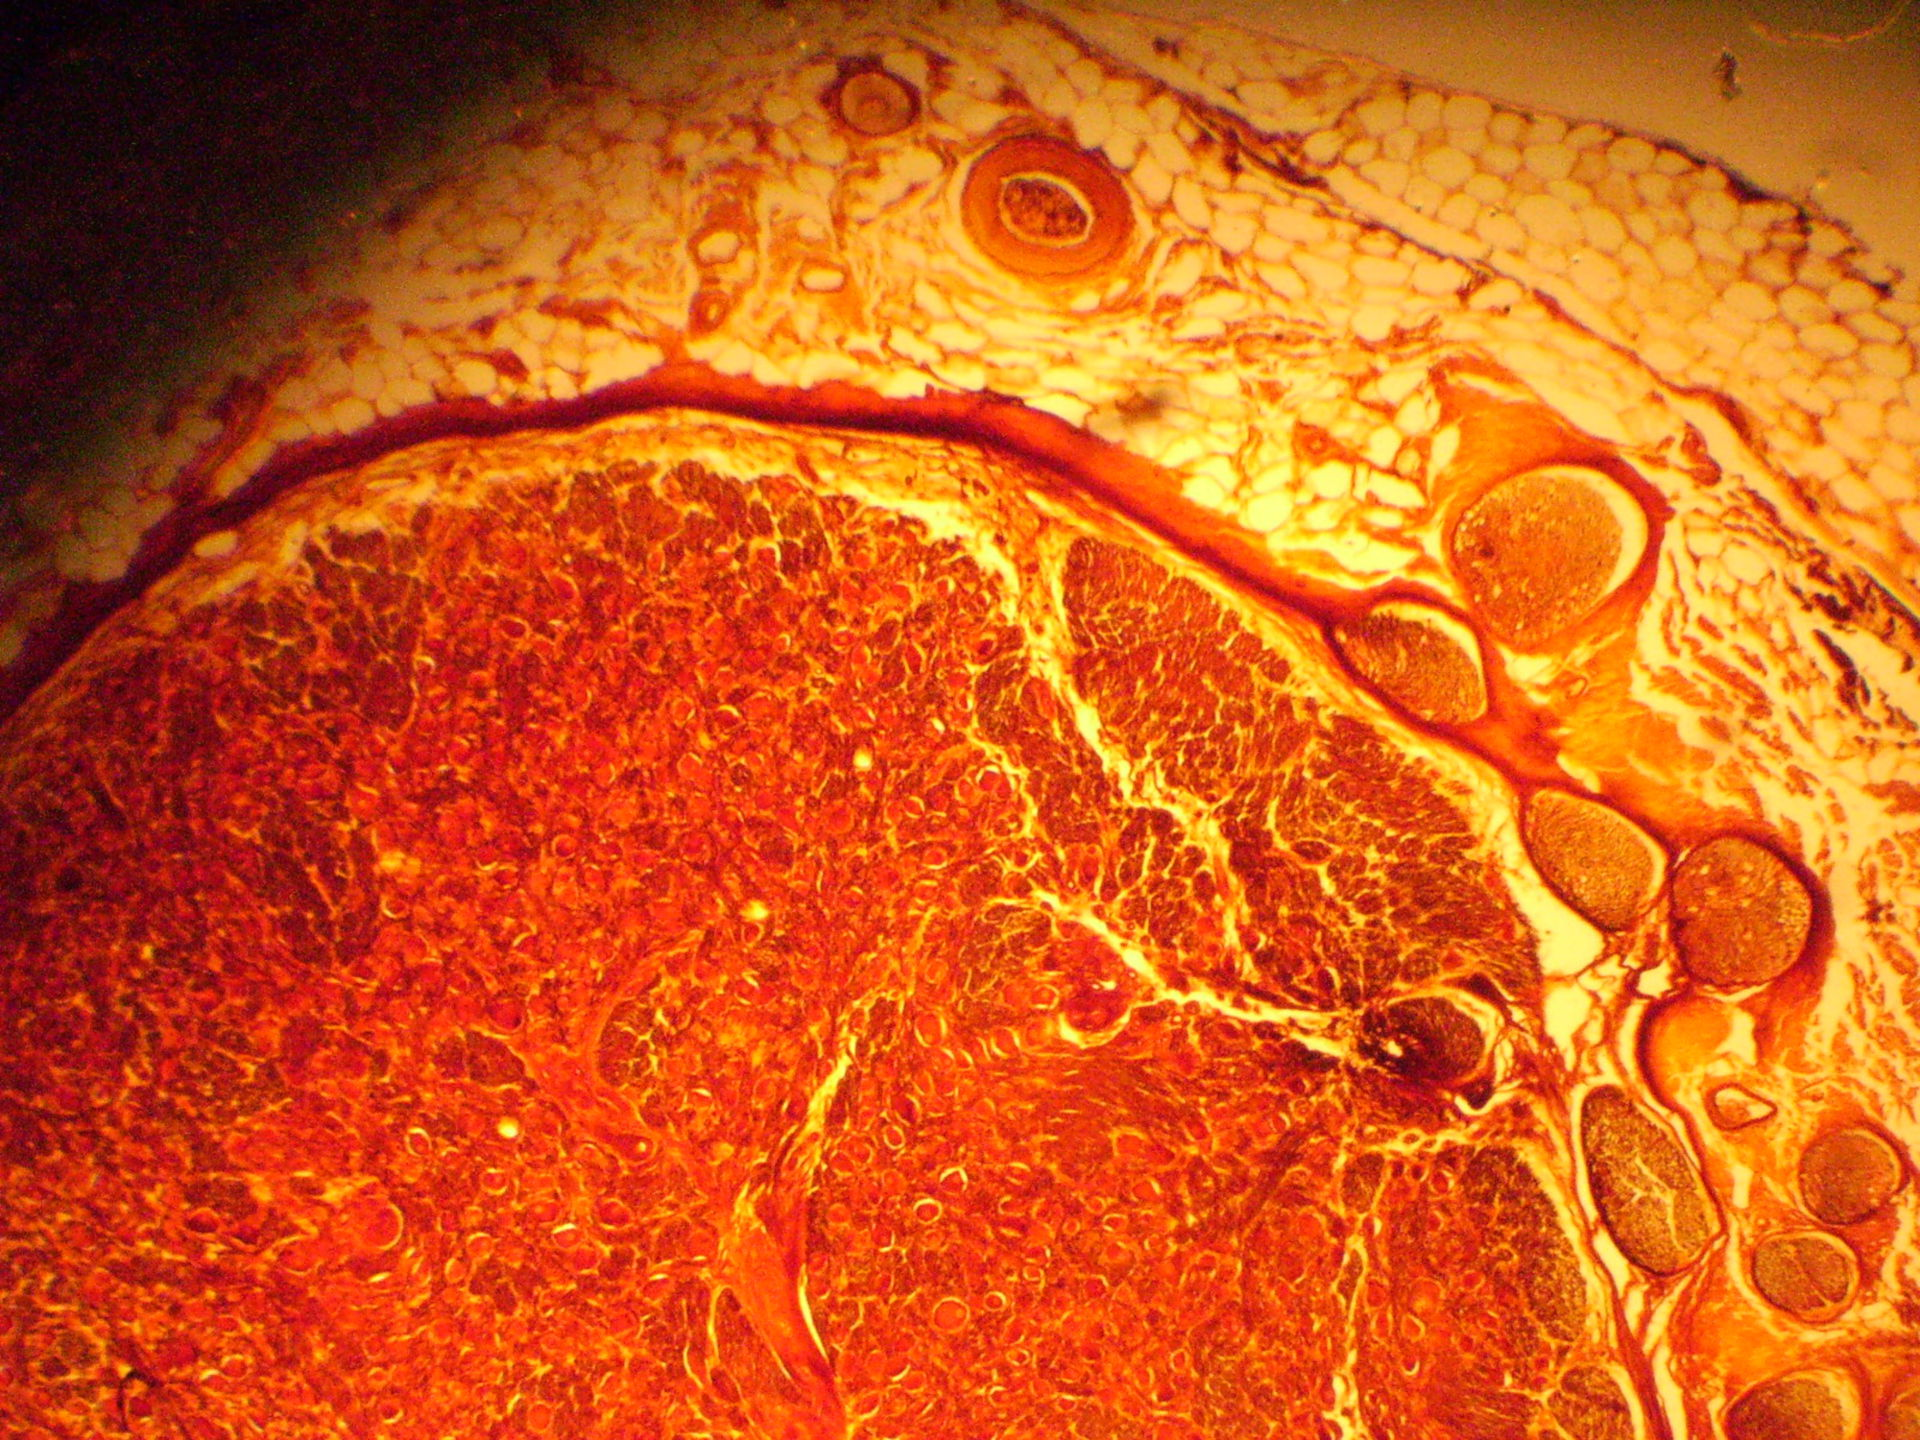 Multipolare Ganglienzelle